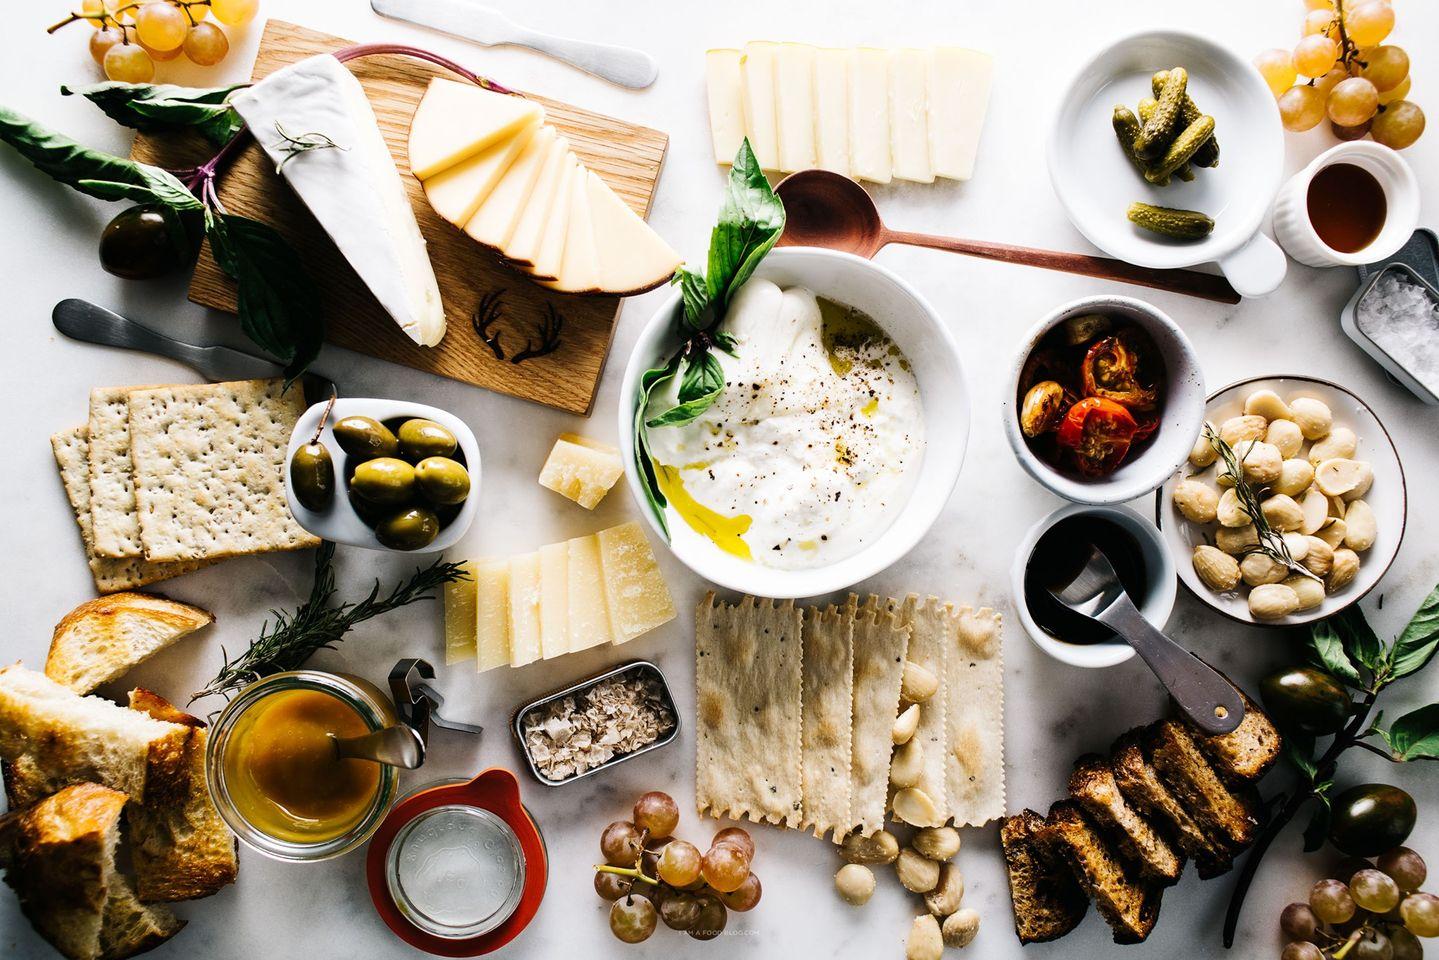 The Gourmet Pantry Header Image